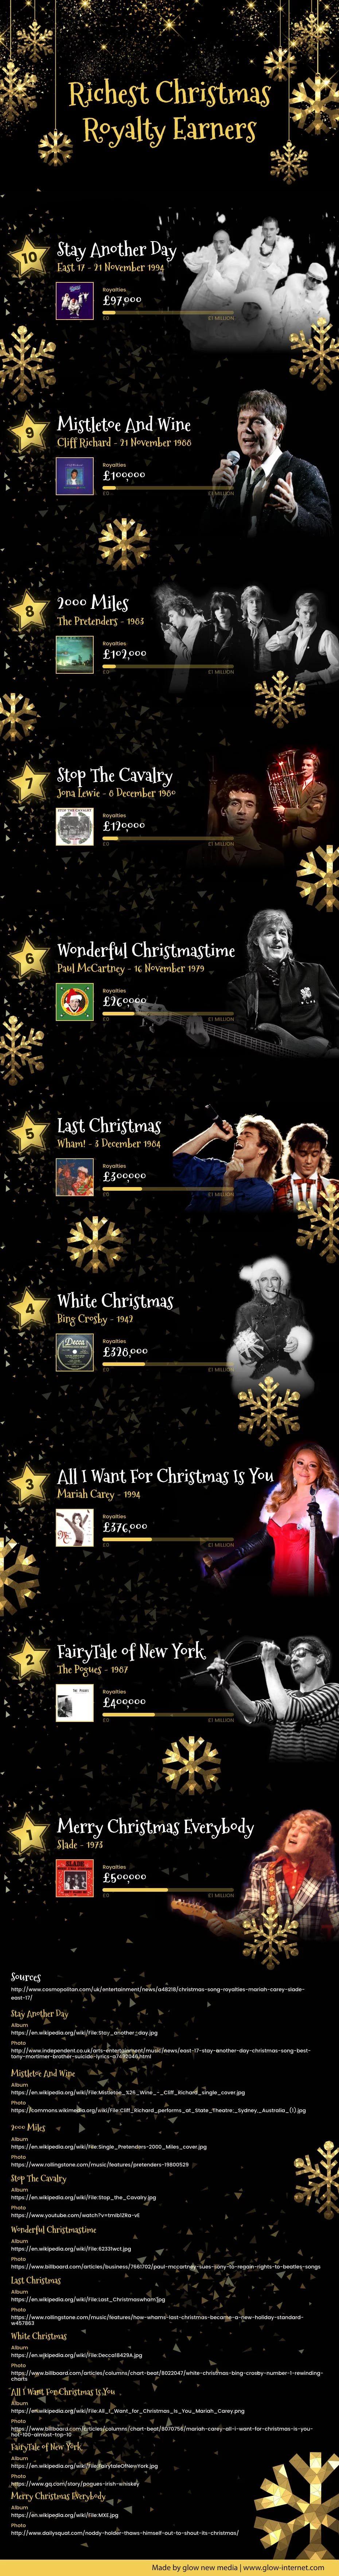 Best Uk Christmas Songs Christmas Infographic Infographic Best Christmas Songs